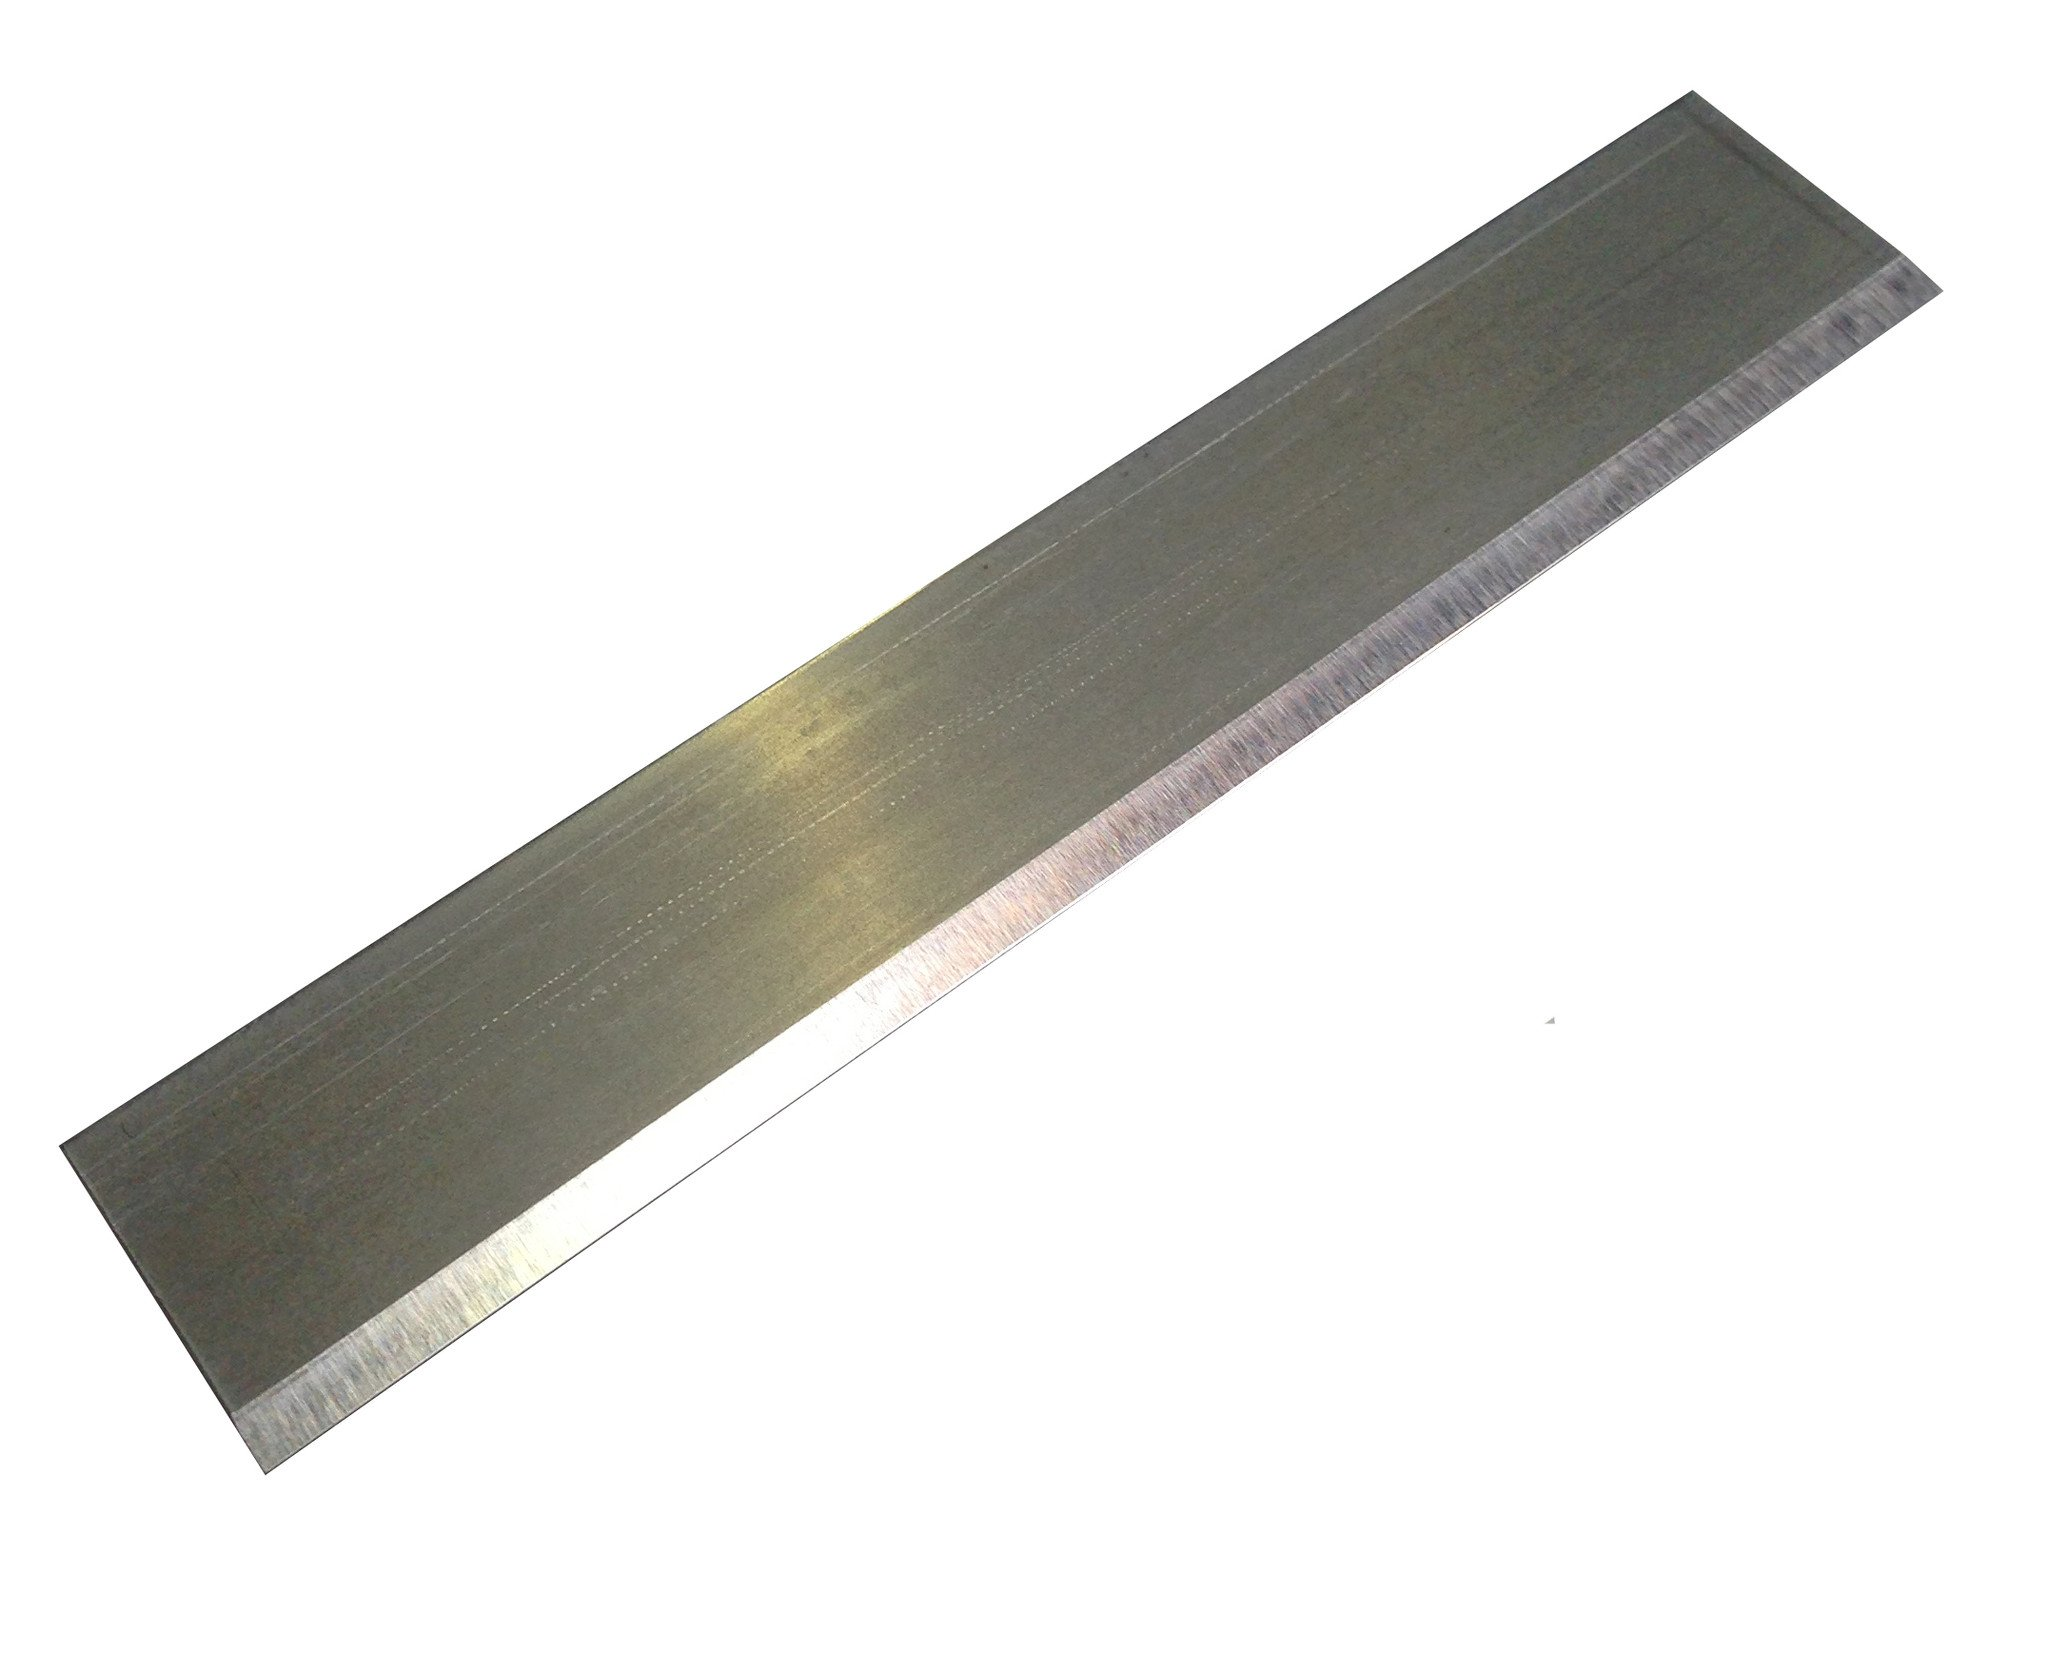 "Cucamonga 4"" Hand Scraper Blades"